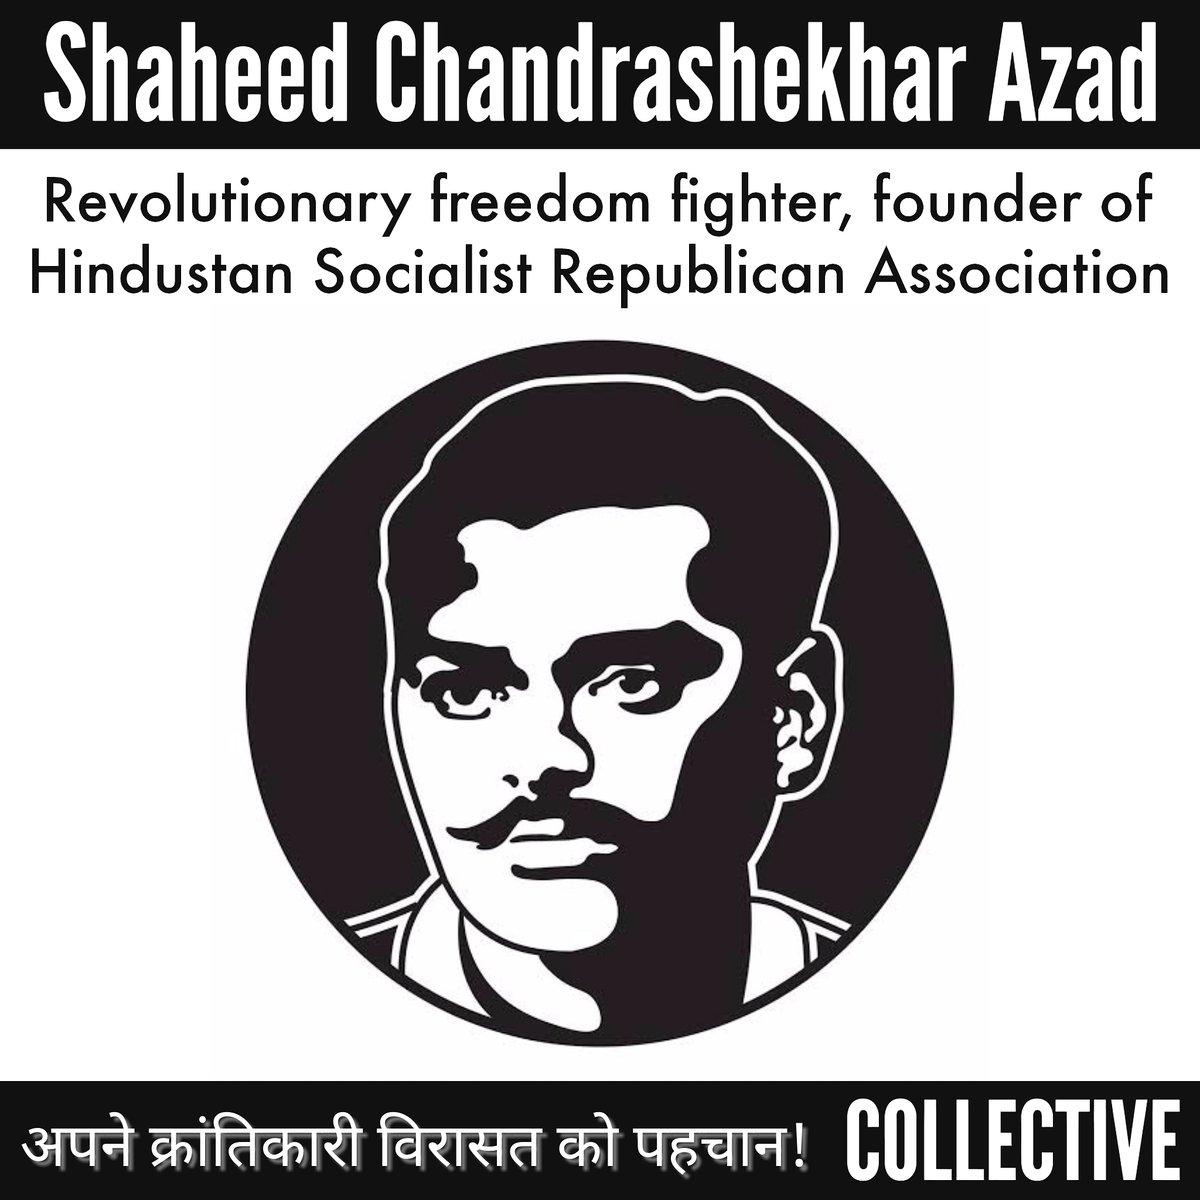 #ChandrashekharAzad zinda hai kheton mei, karkhanon mei.  Drawing strength from the revolutionary ideals of a Socialist South Asian 'azadi' that Kakori martyrs died for. #martyrsday #lalsalaamcomrade